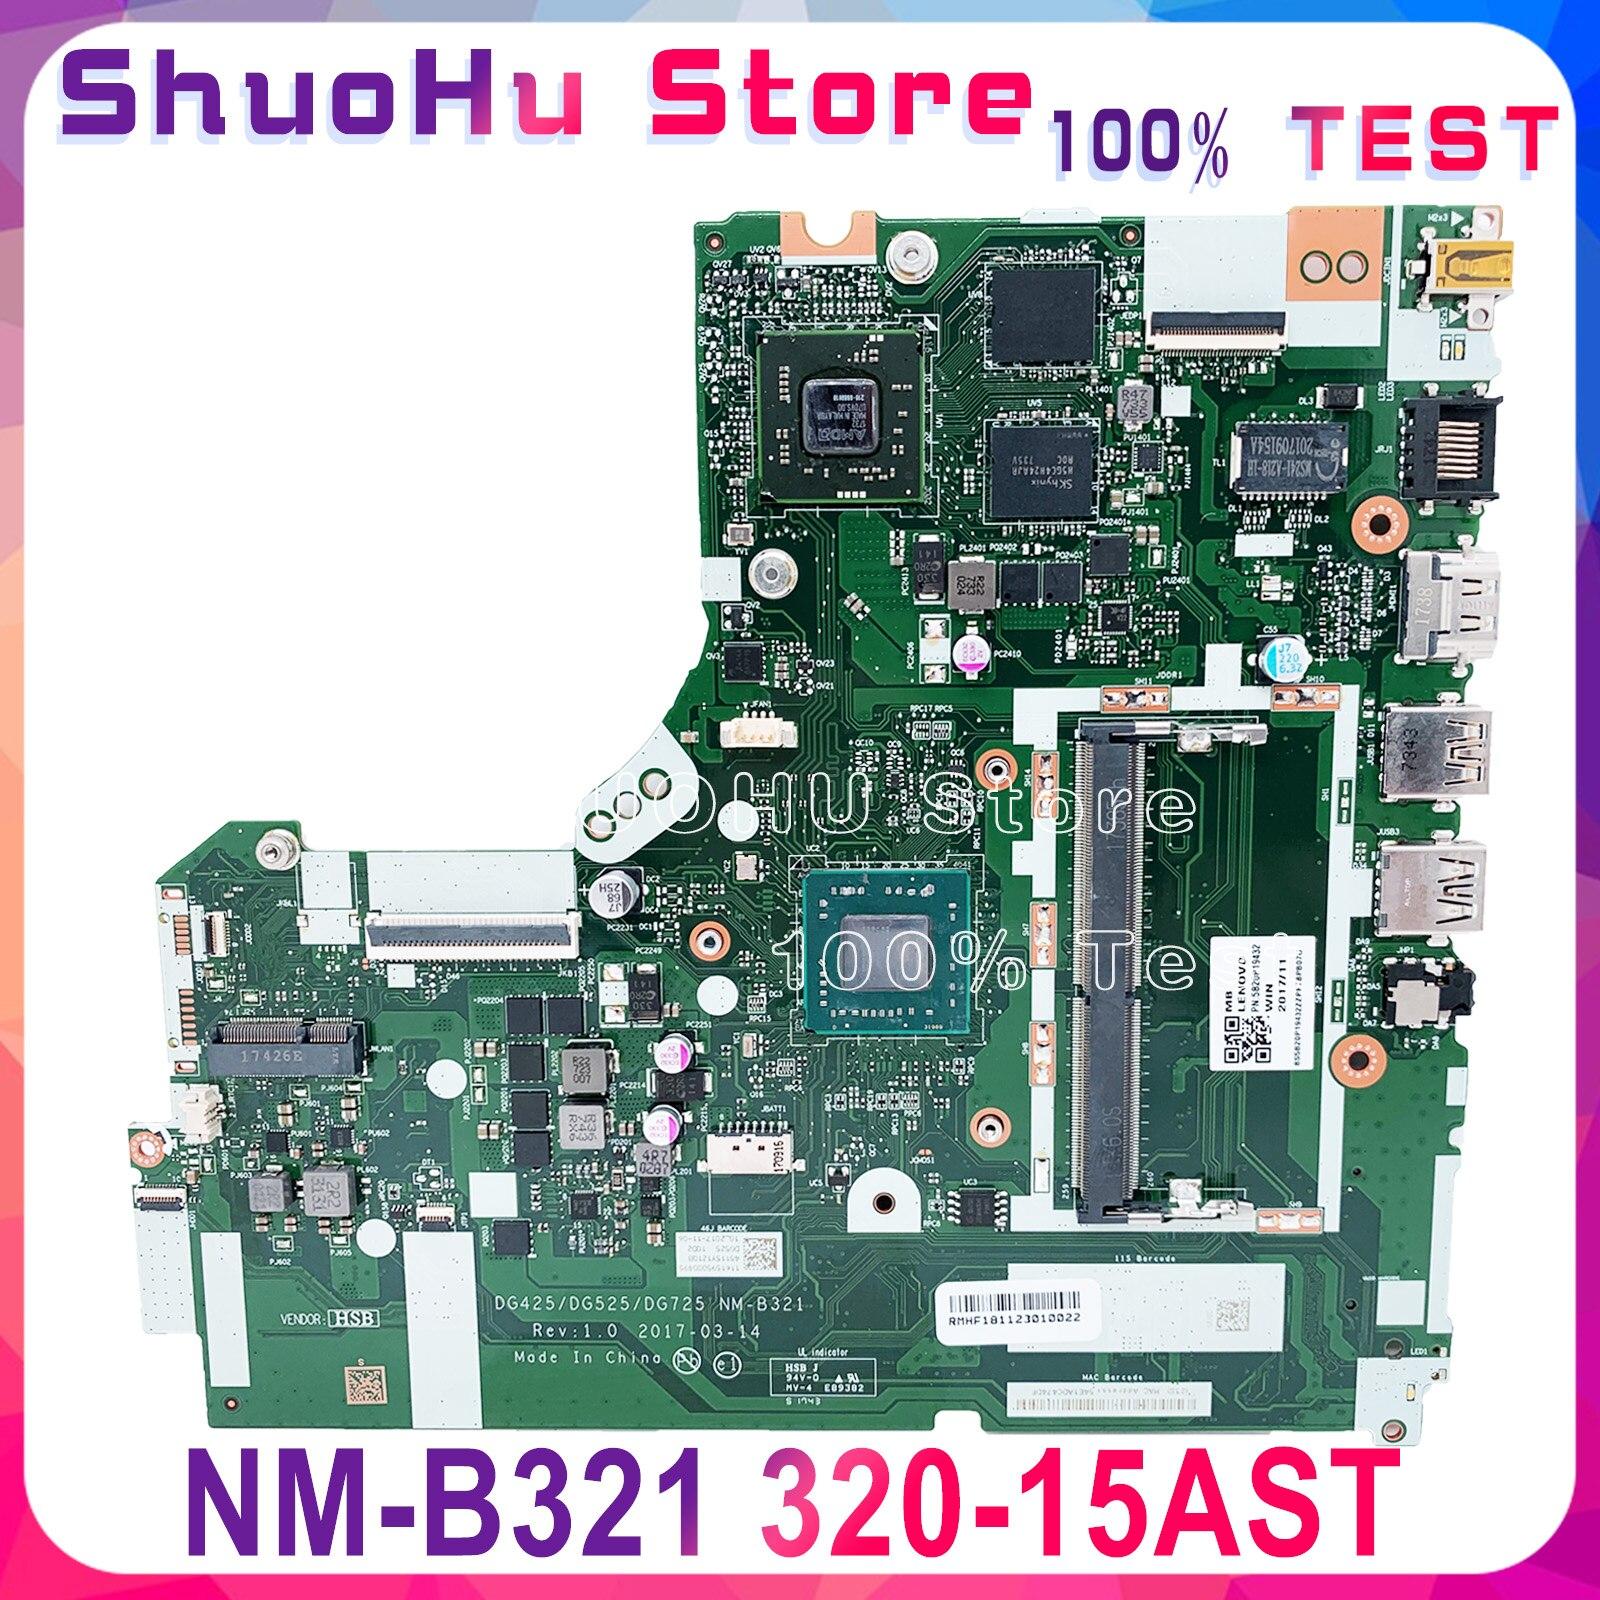 KEFU NM-B321 Motherboard For Lenovo 330-15AST 320-15AST Motherboard DG425 DG525 DG725 NM-B321 AMD GPU Test Original Work